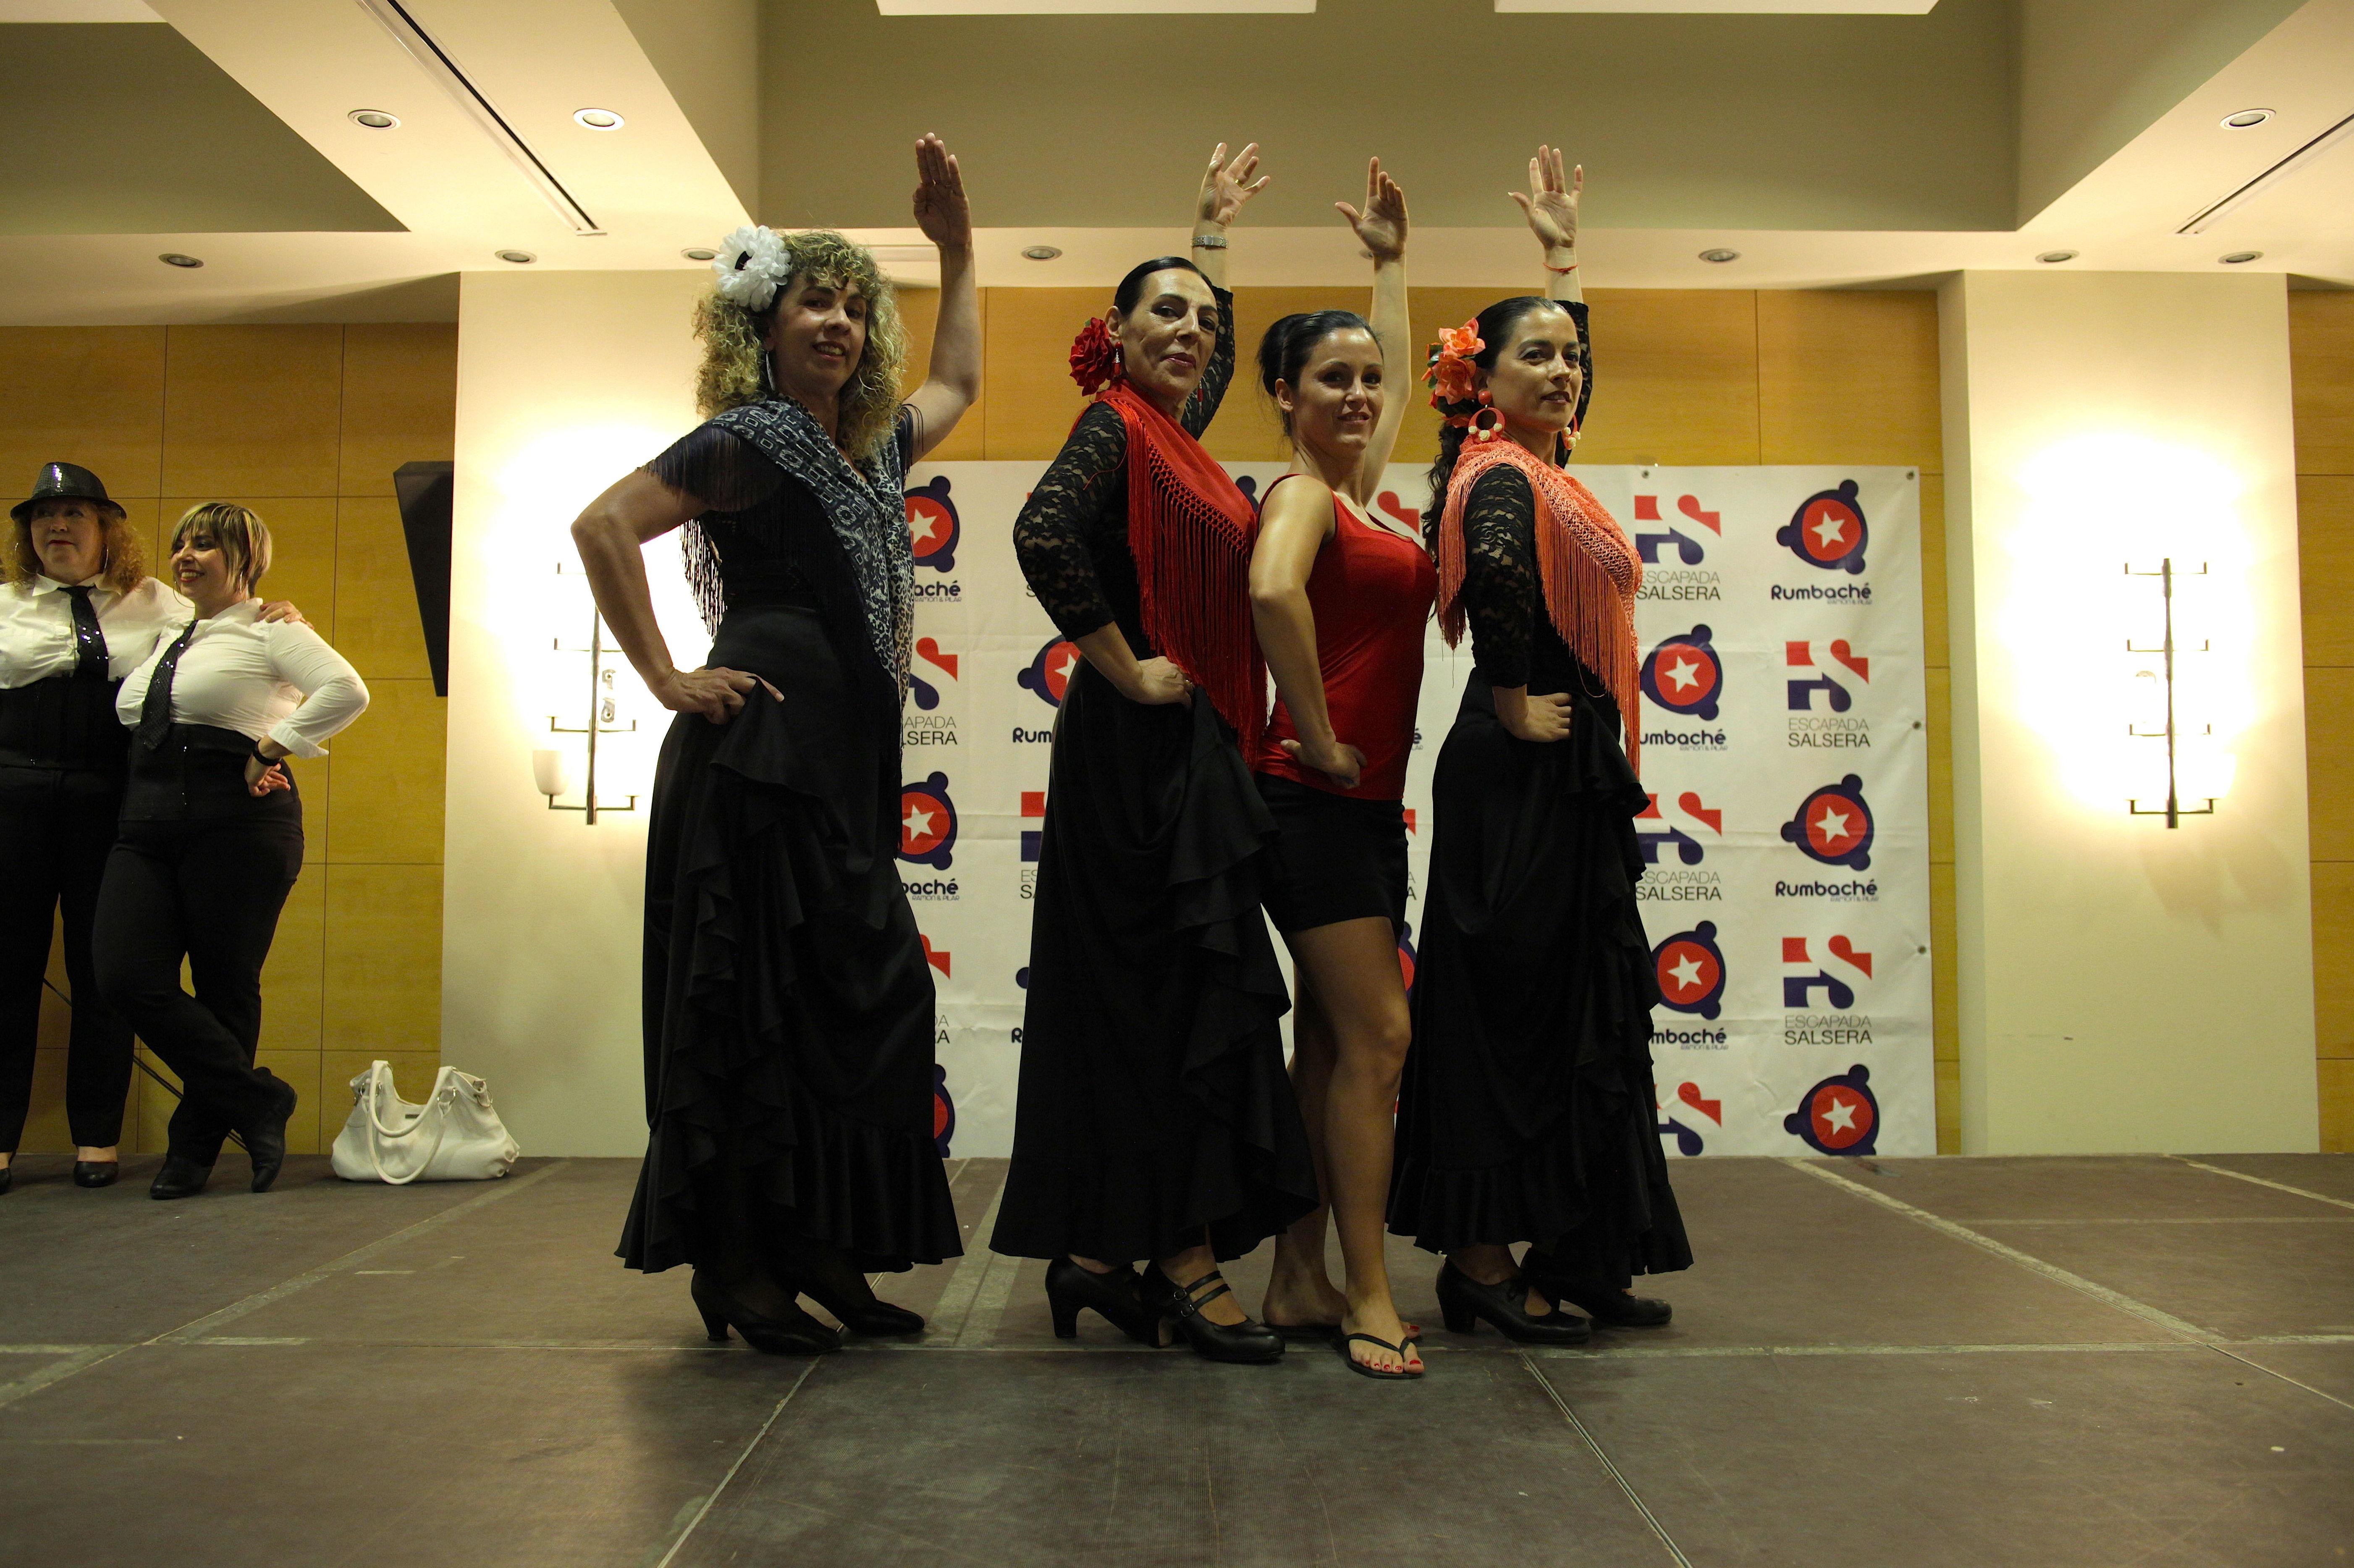 Clases de Flamenco Miercoles 18:30 con Yolanda Rodriguez [Festival Fin de Curso 2015]